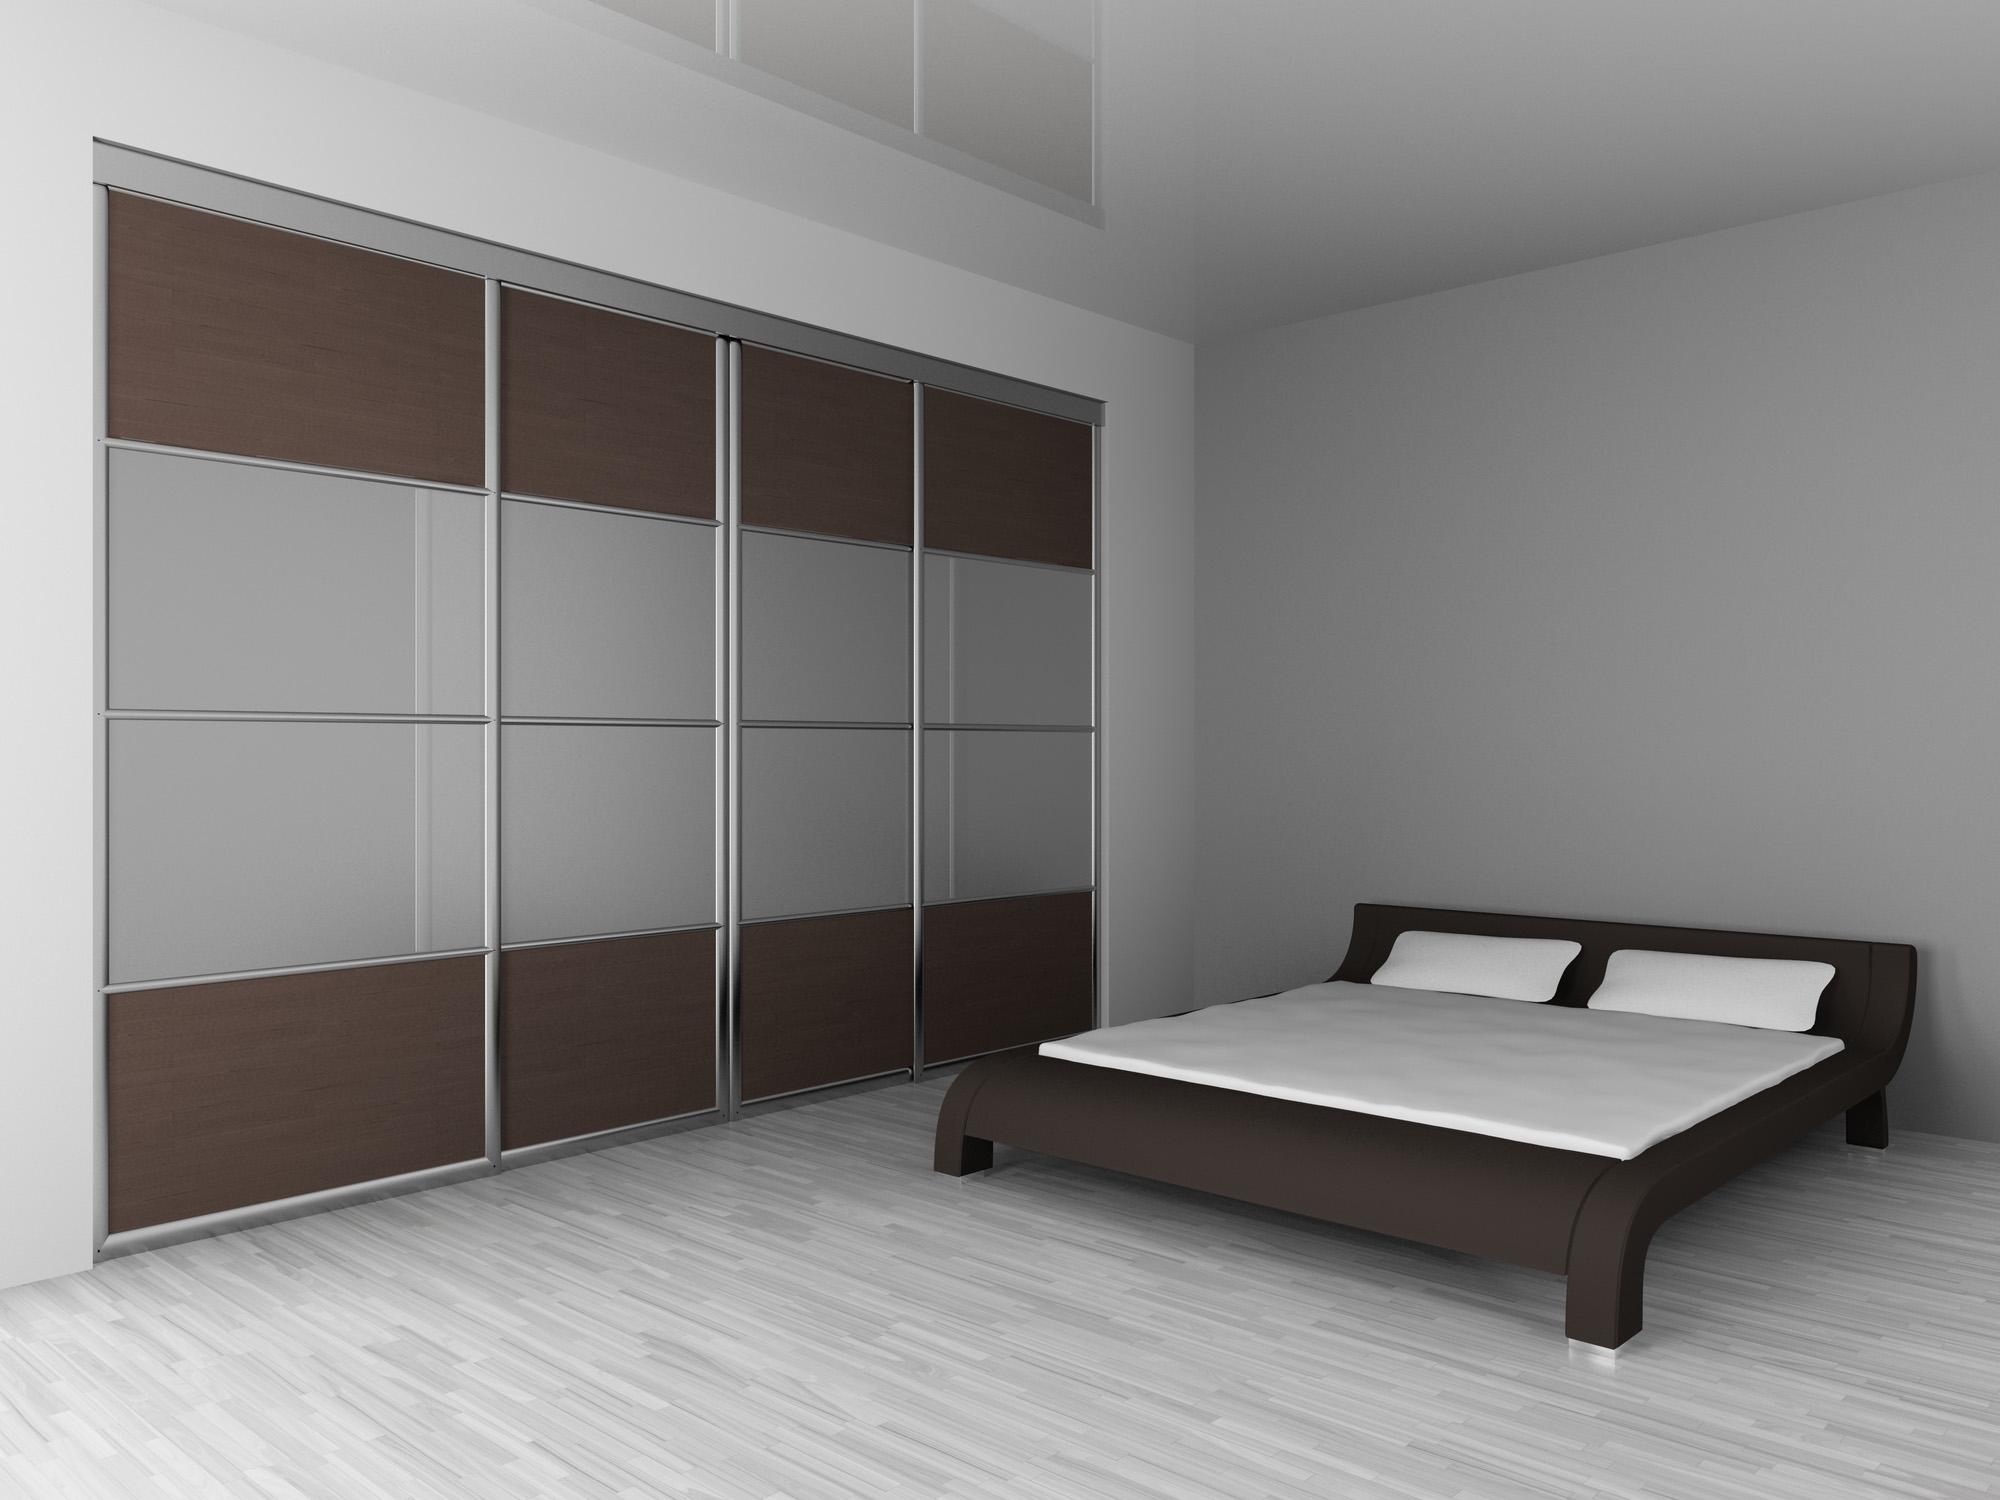 wardrobe with sliding doors, modern bedroom furniture